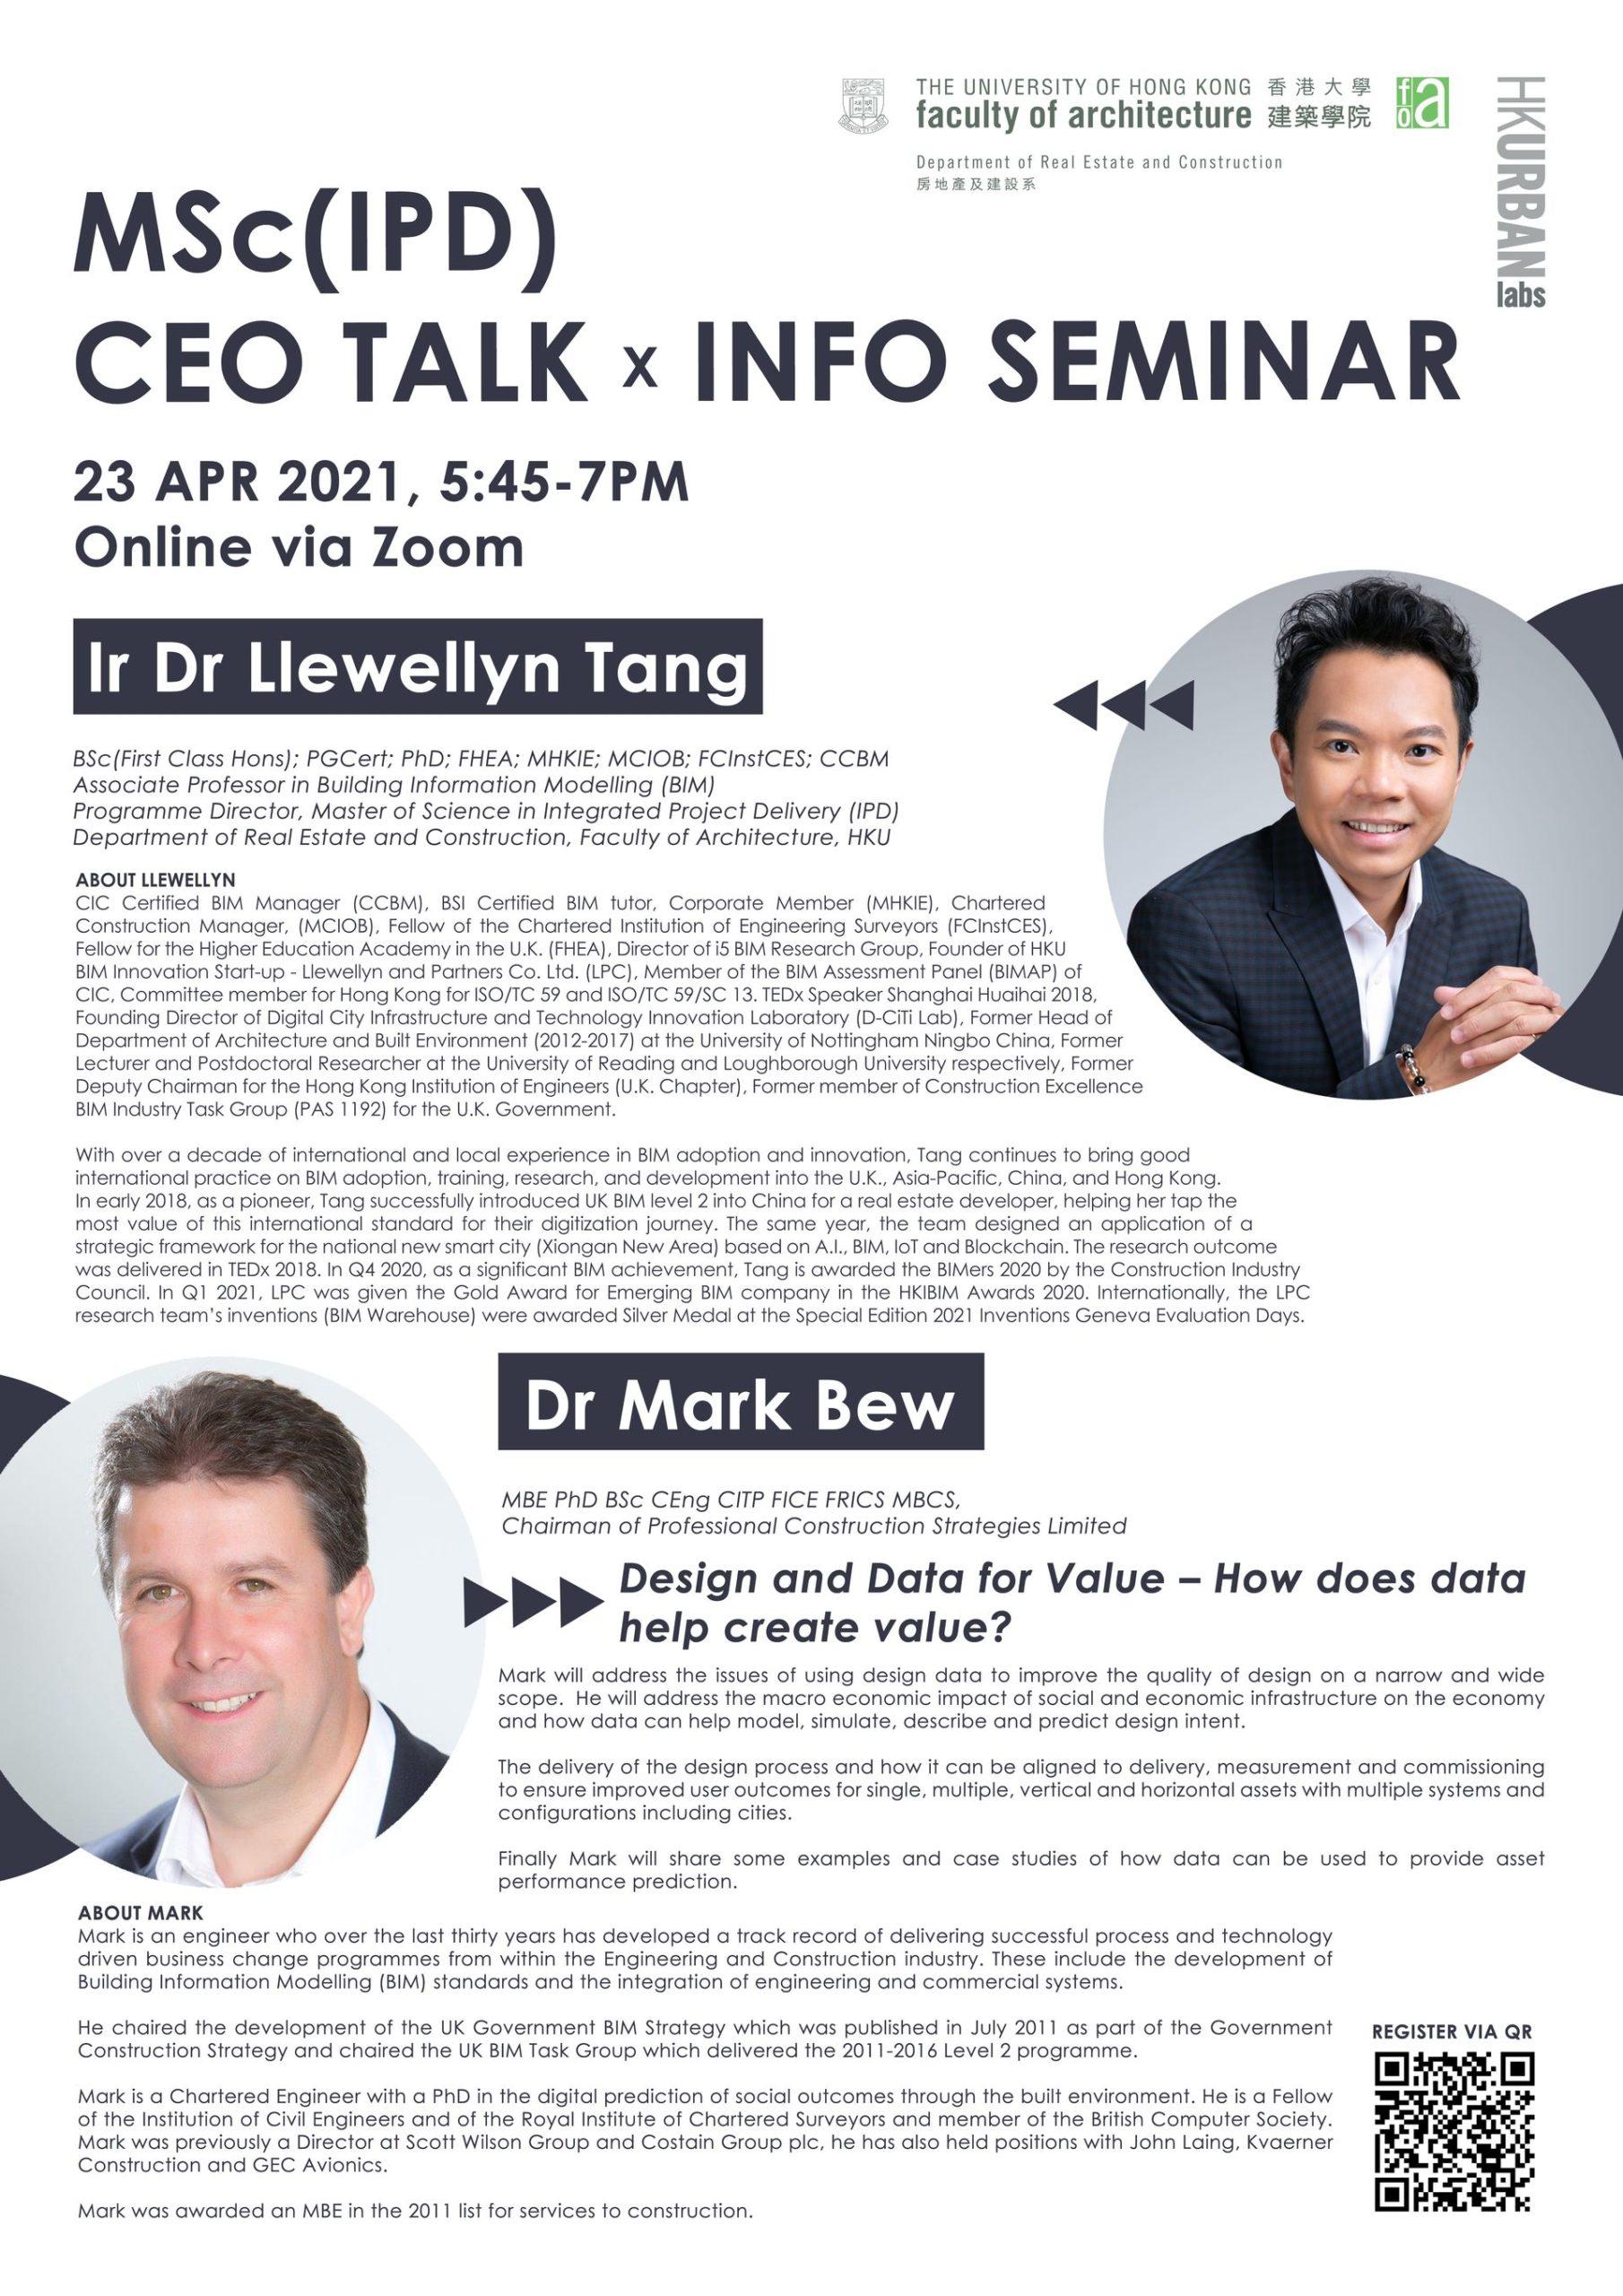 Llewellyn Tang and Mark Bew